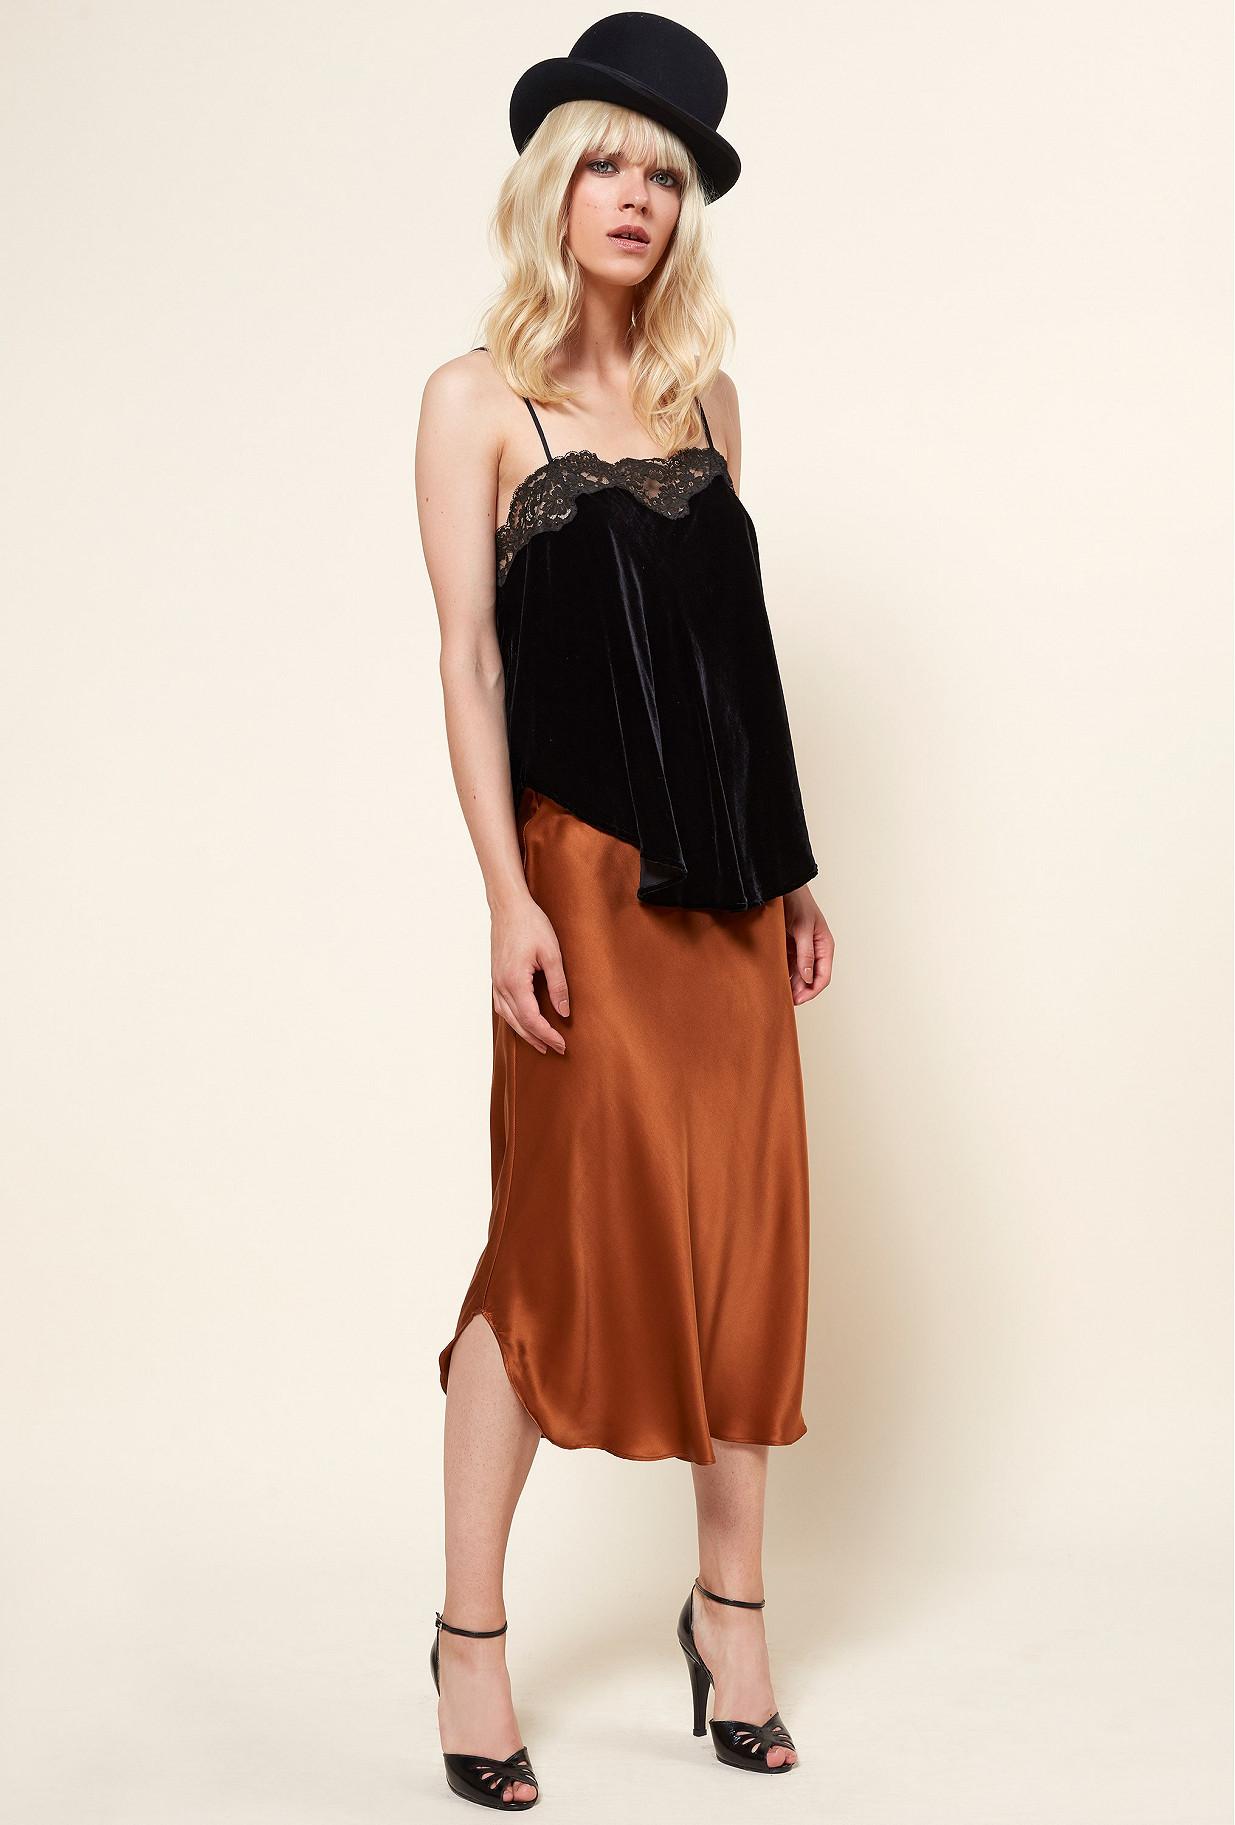 Paris clothes store TOP  Muccia french designer fashion Paris